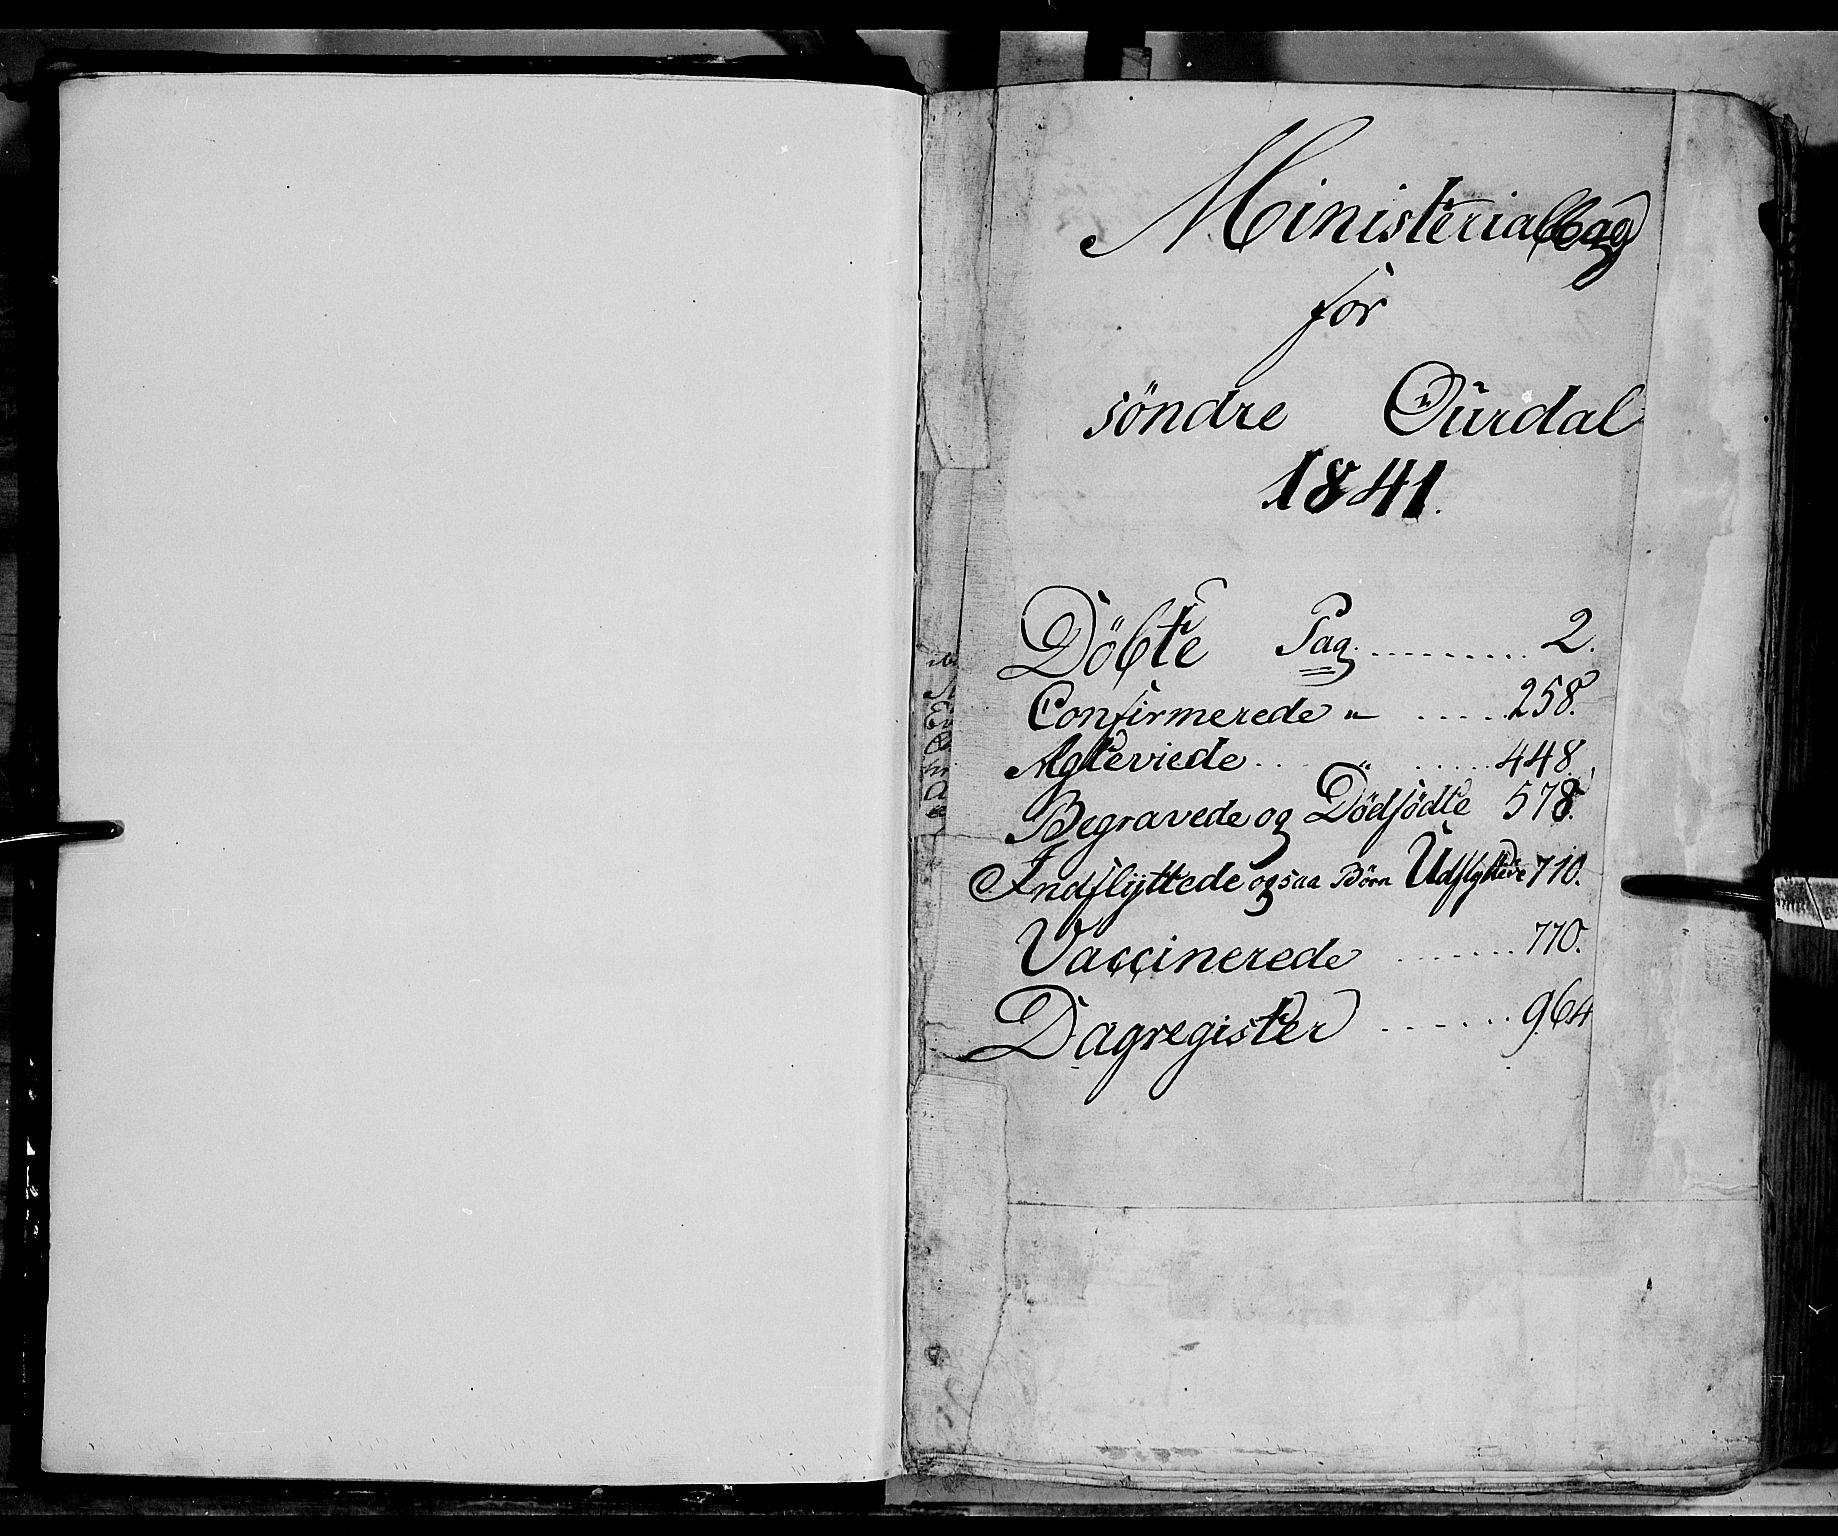 SAH, Sør-Aurdal prestekontor, Ministerialbok nr. 4, 1841-1849